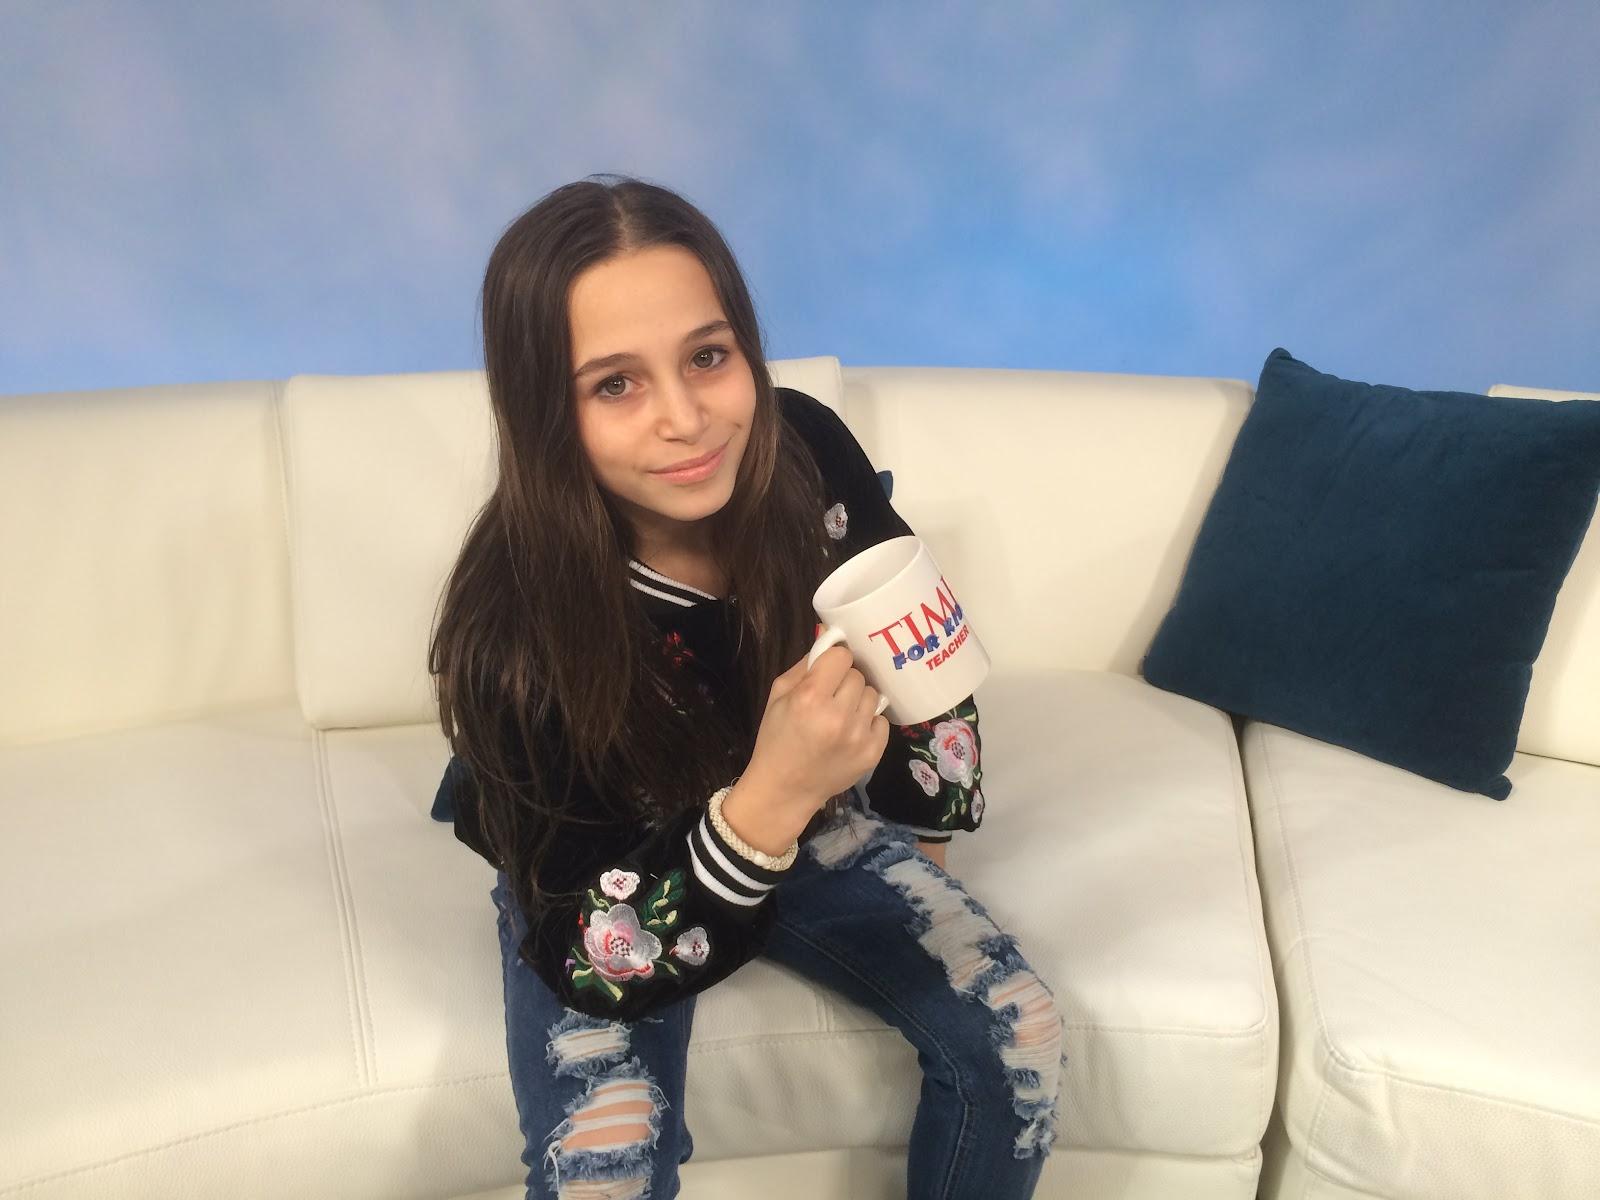 11 Year Old Hip Hop Sensation Sky Katz Ends 2016 On A High Note [Music News]